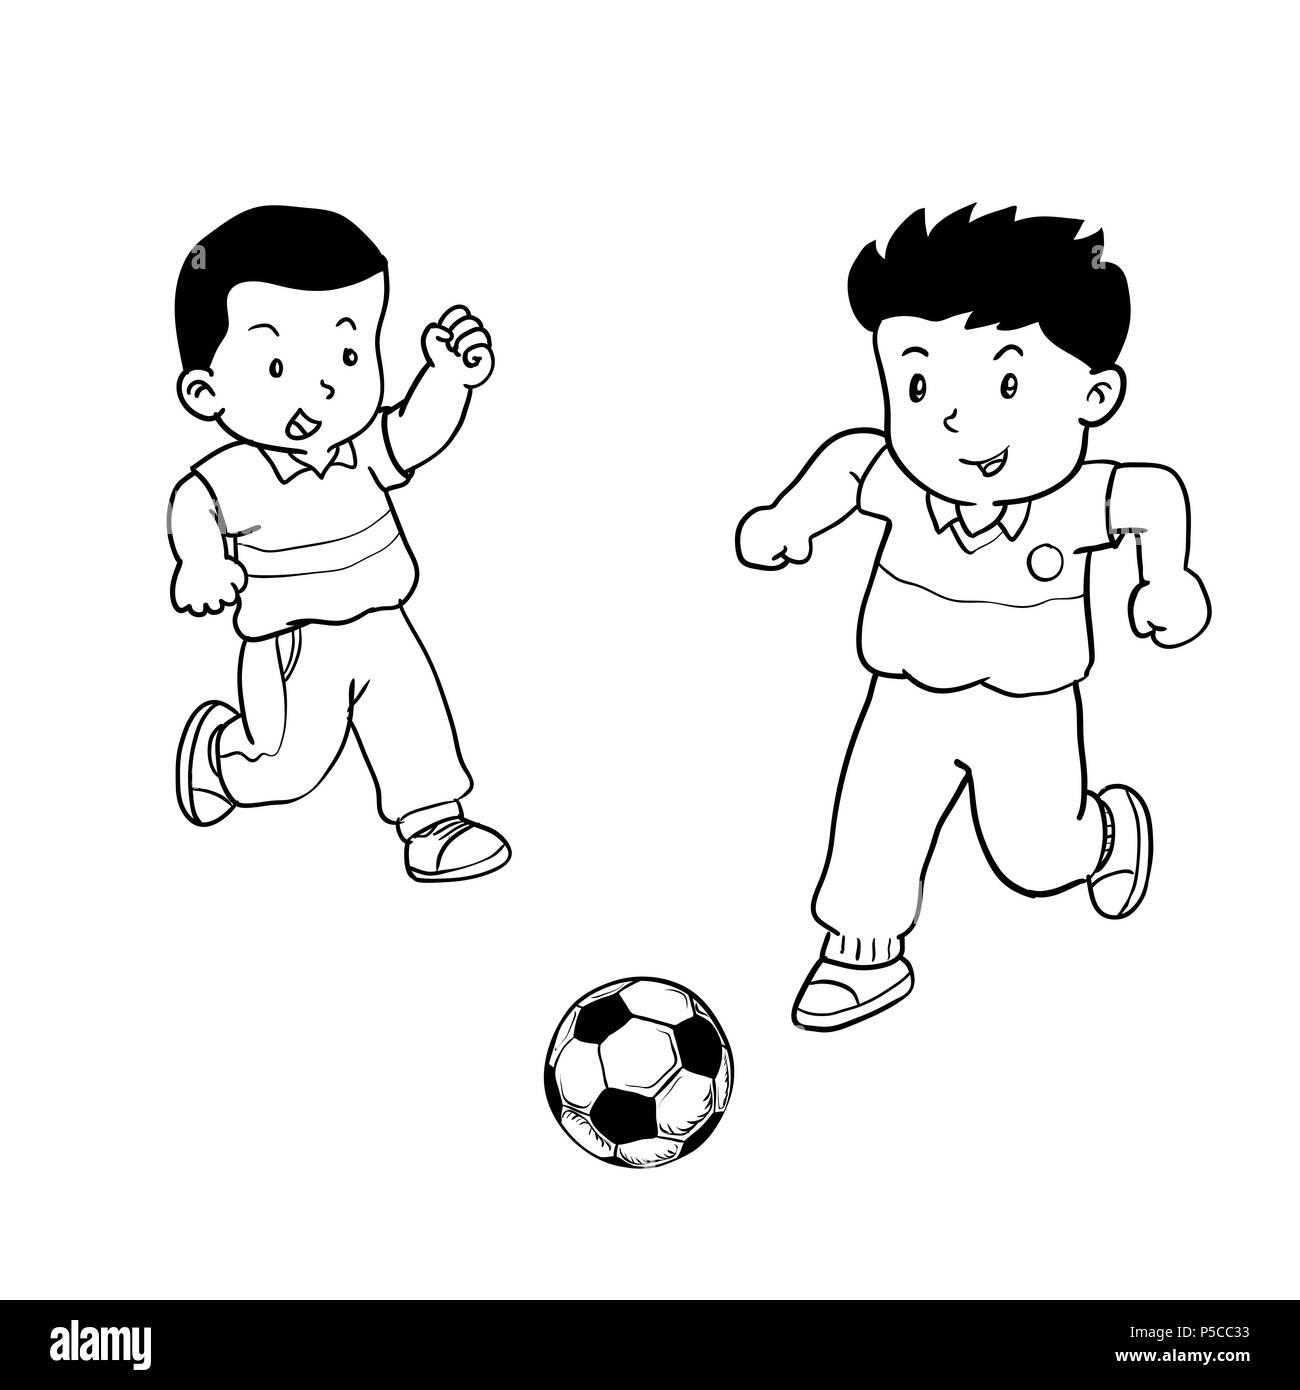 Football Cartoon Imágenes De Stock Football Cartoon Fotos De Stock